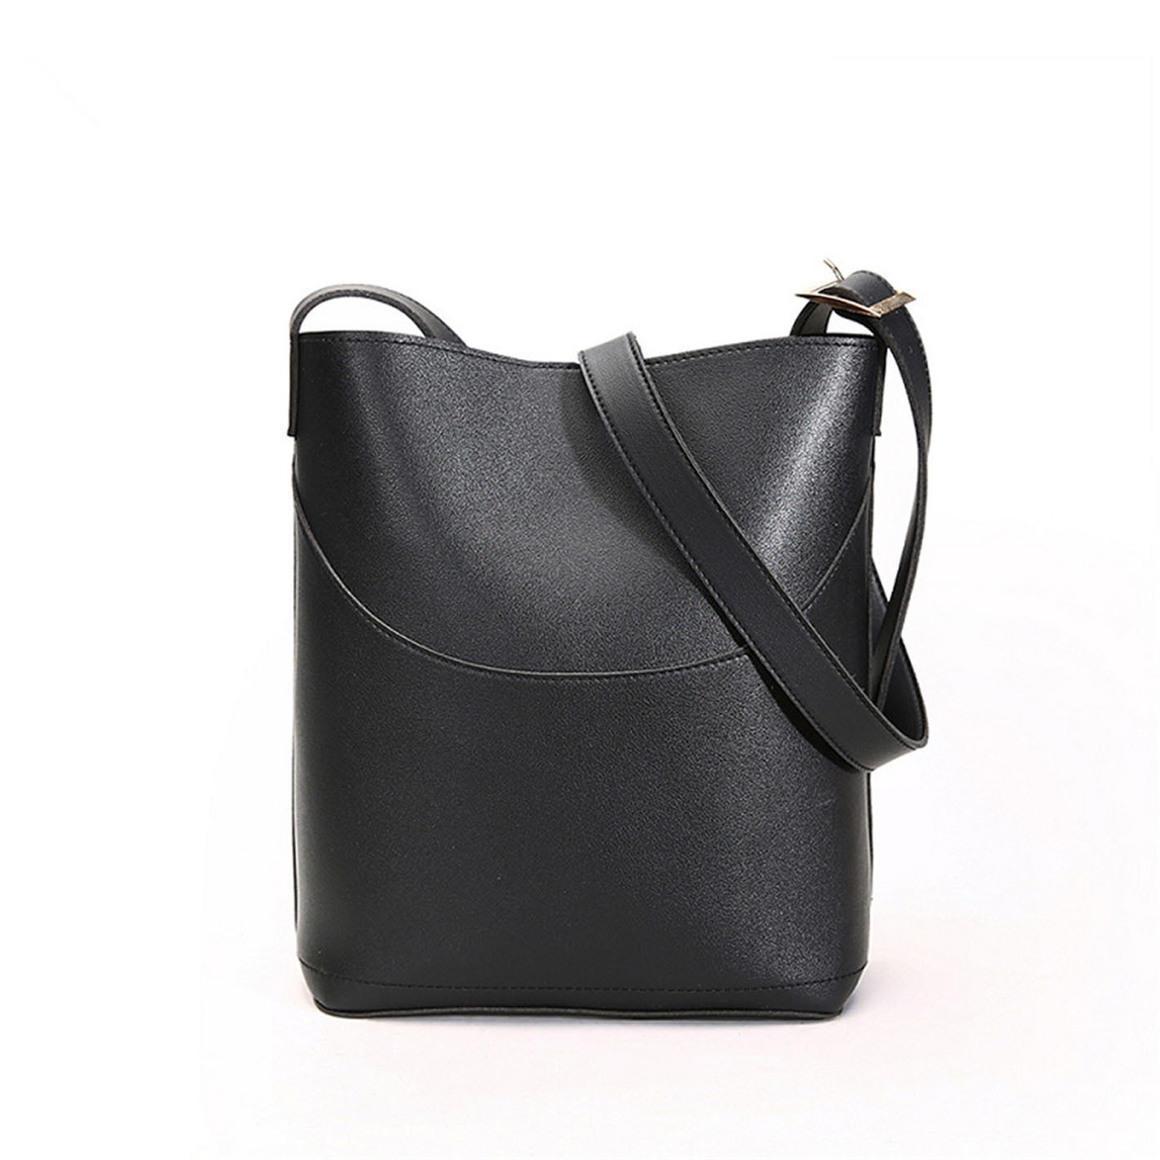 THSB1013: Black:  Eva Bucket Tote Bag | Trada Marketplace